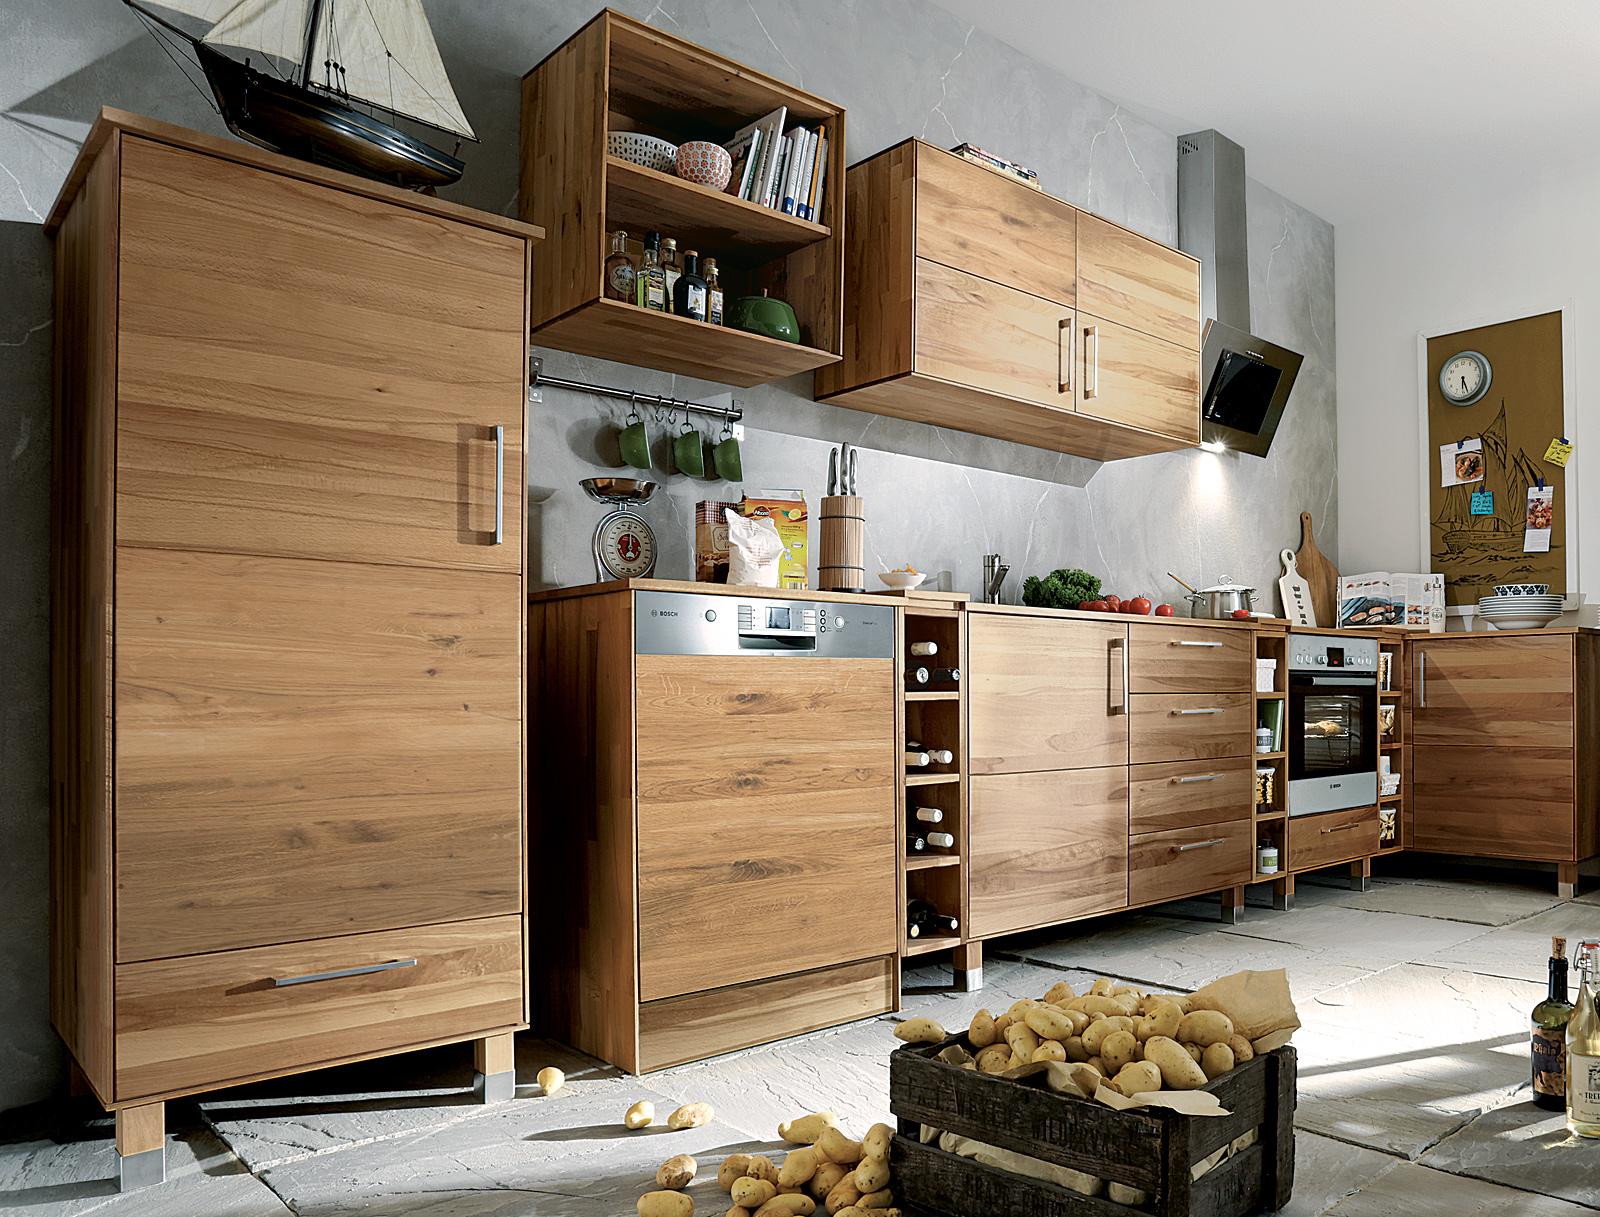 k hlschrankmodul culinara eiche. Black Bedroom Furniture Sets. Home Design Ideas